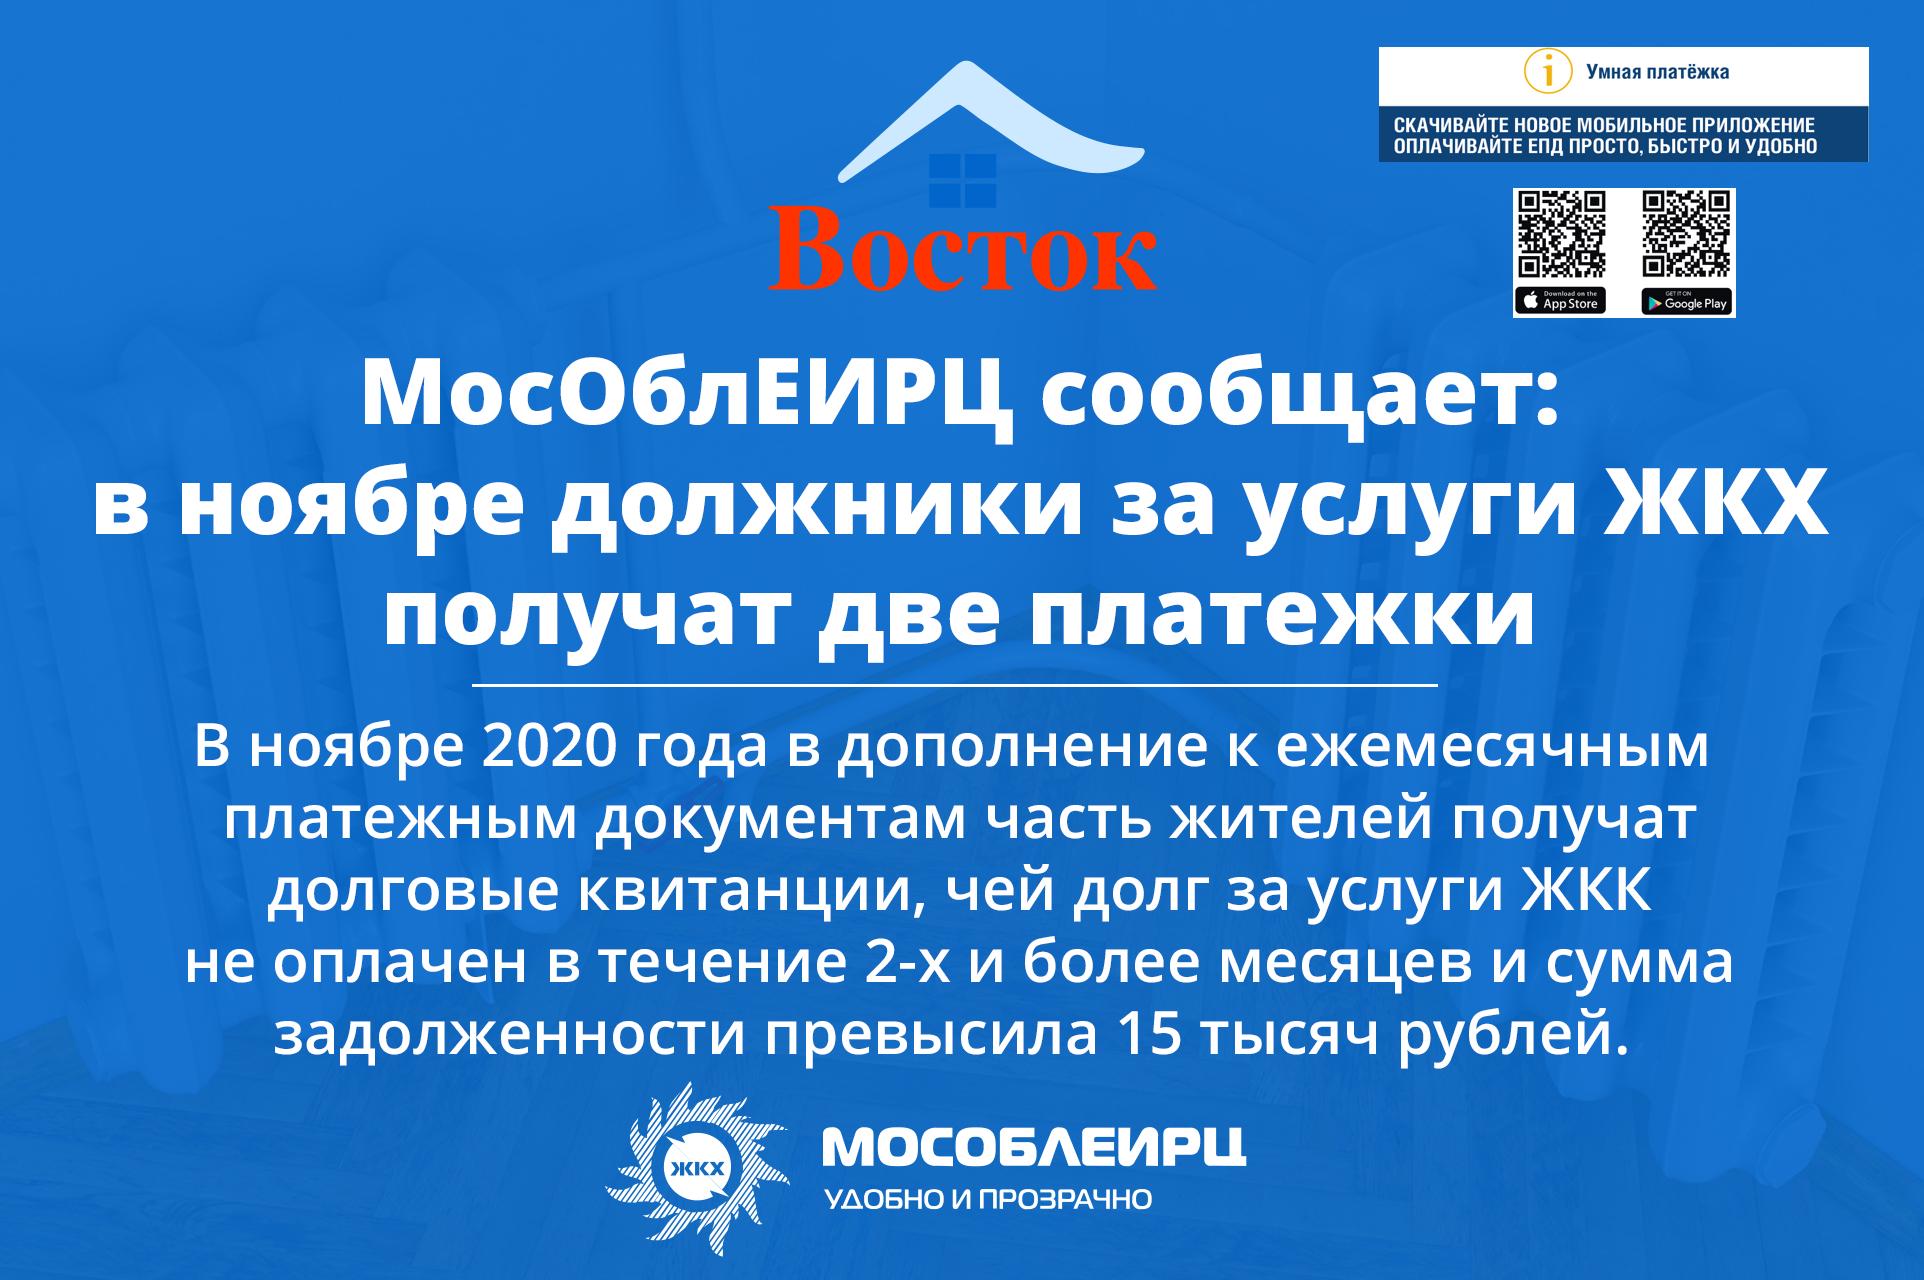 МосОблЕИРЦ: в ноябре должники за услуги ЖКХ получат две платежки